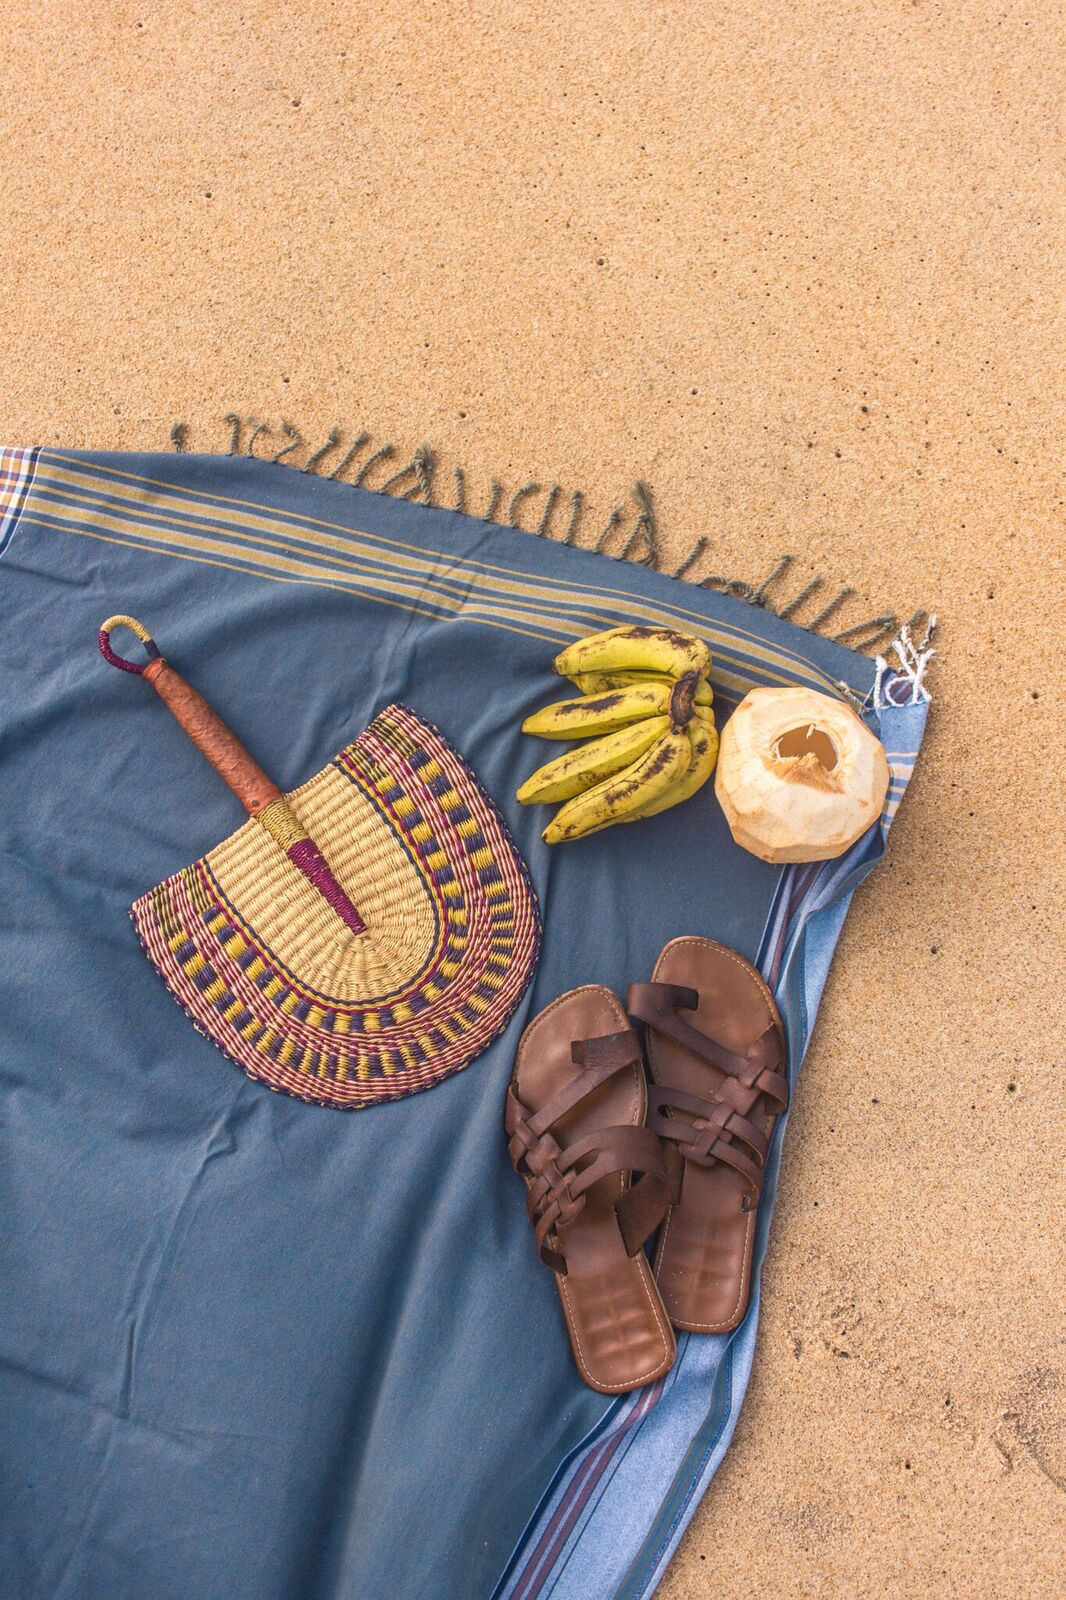 Bananas on beach.jpeg